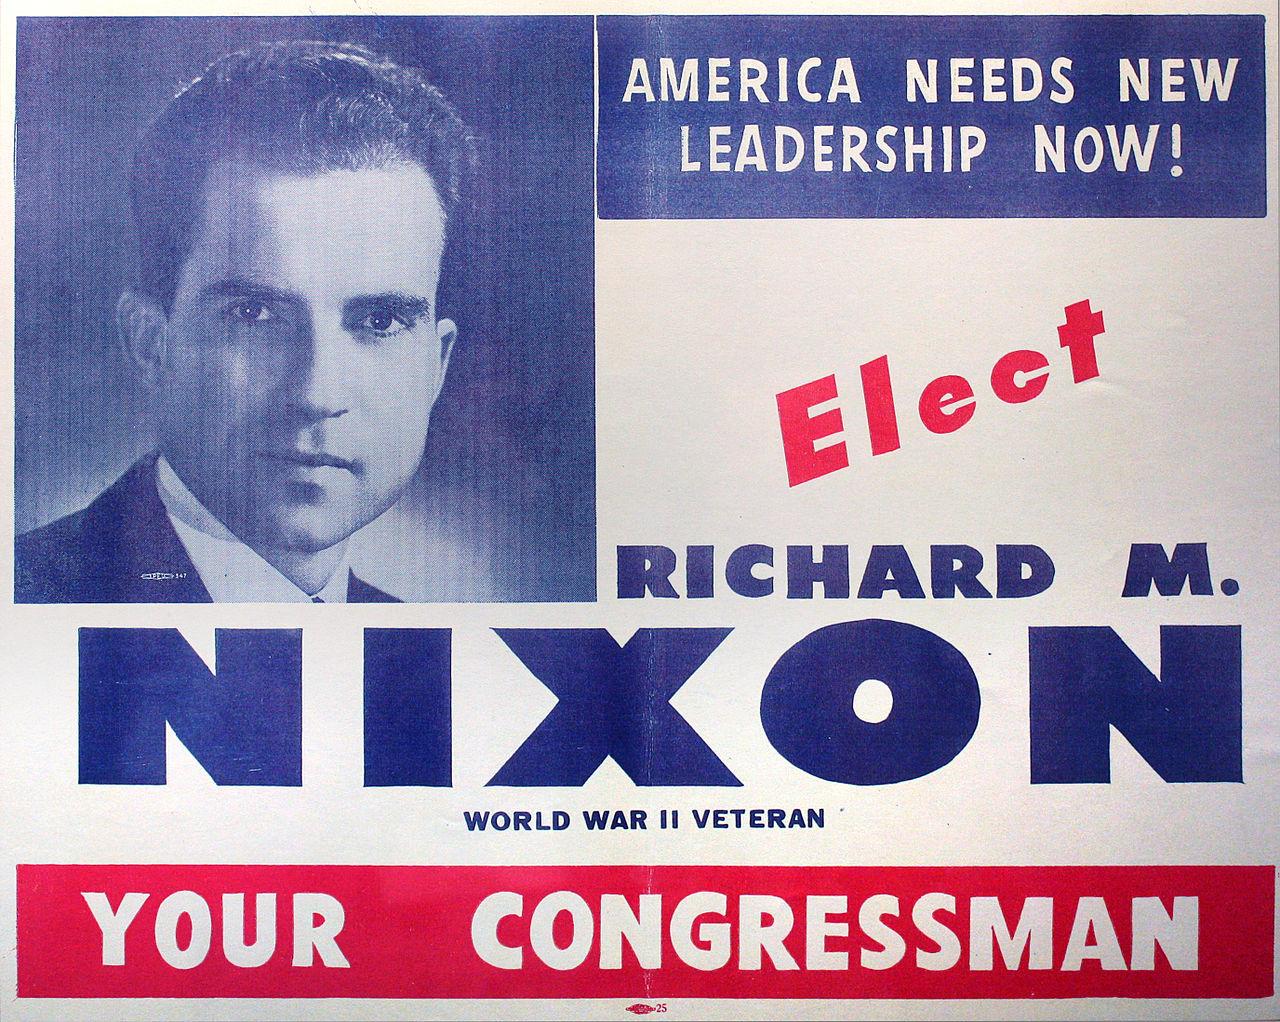 an election handout urging Nixon's election